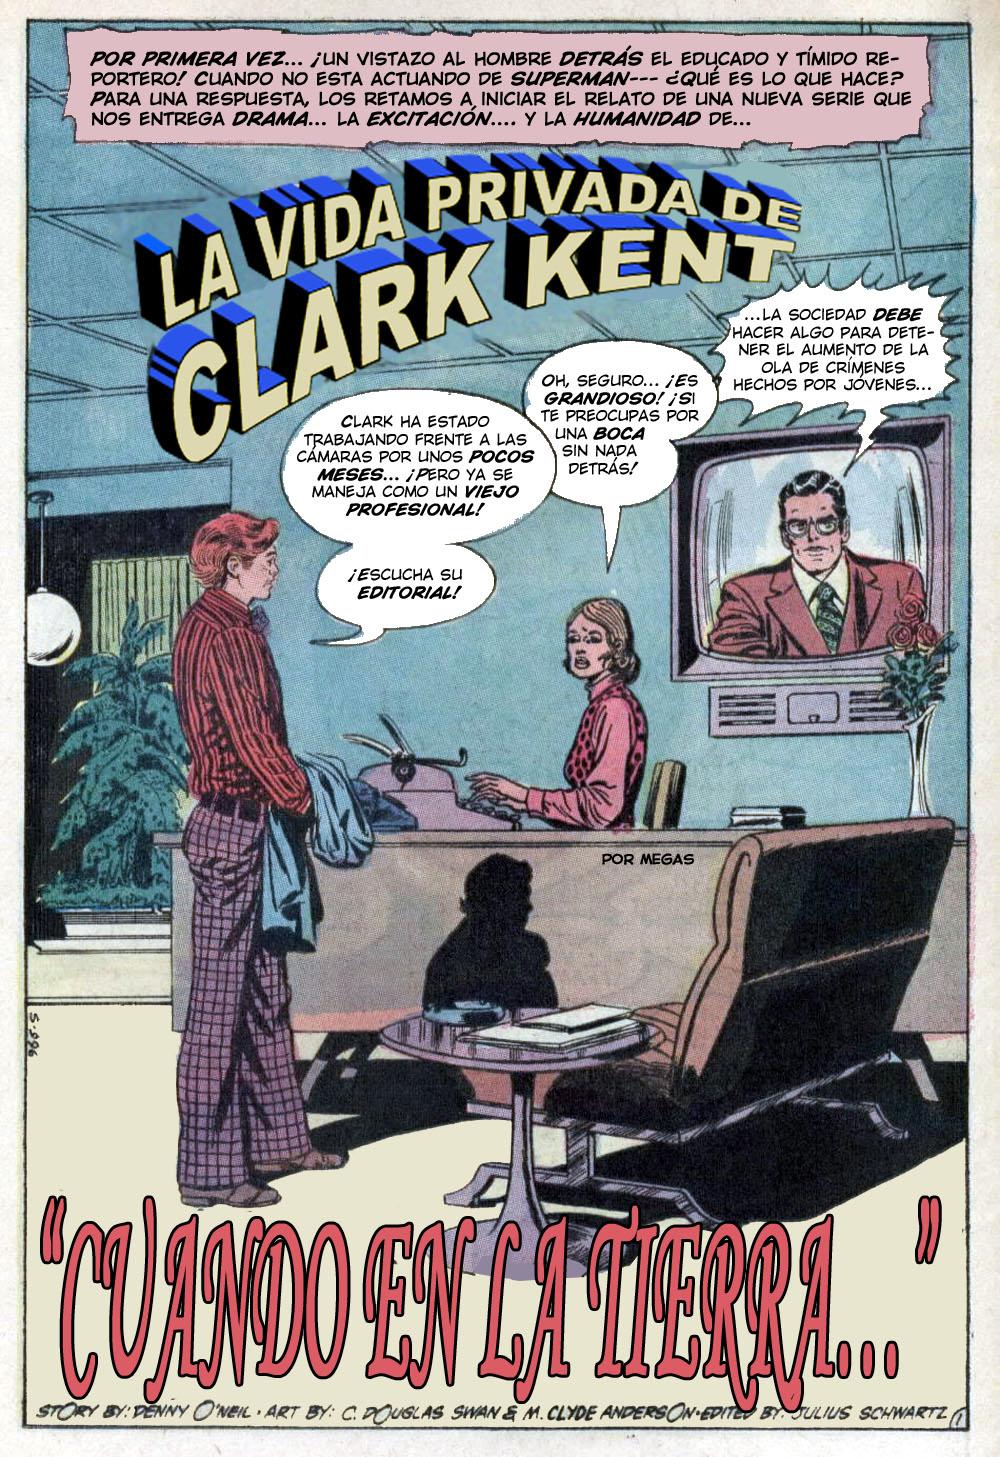 COMIC BOOK FAN AND LOVER: SUPERMAN # 247 (PRE-CRISIS) - DC COMICS